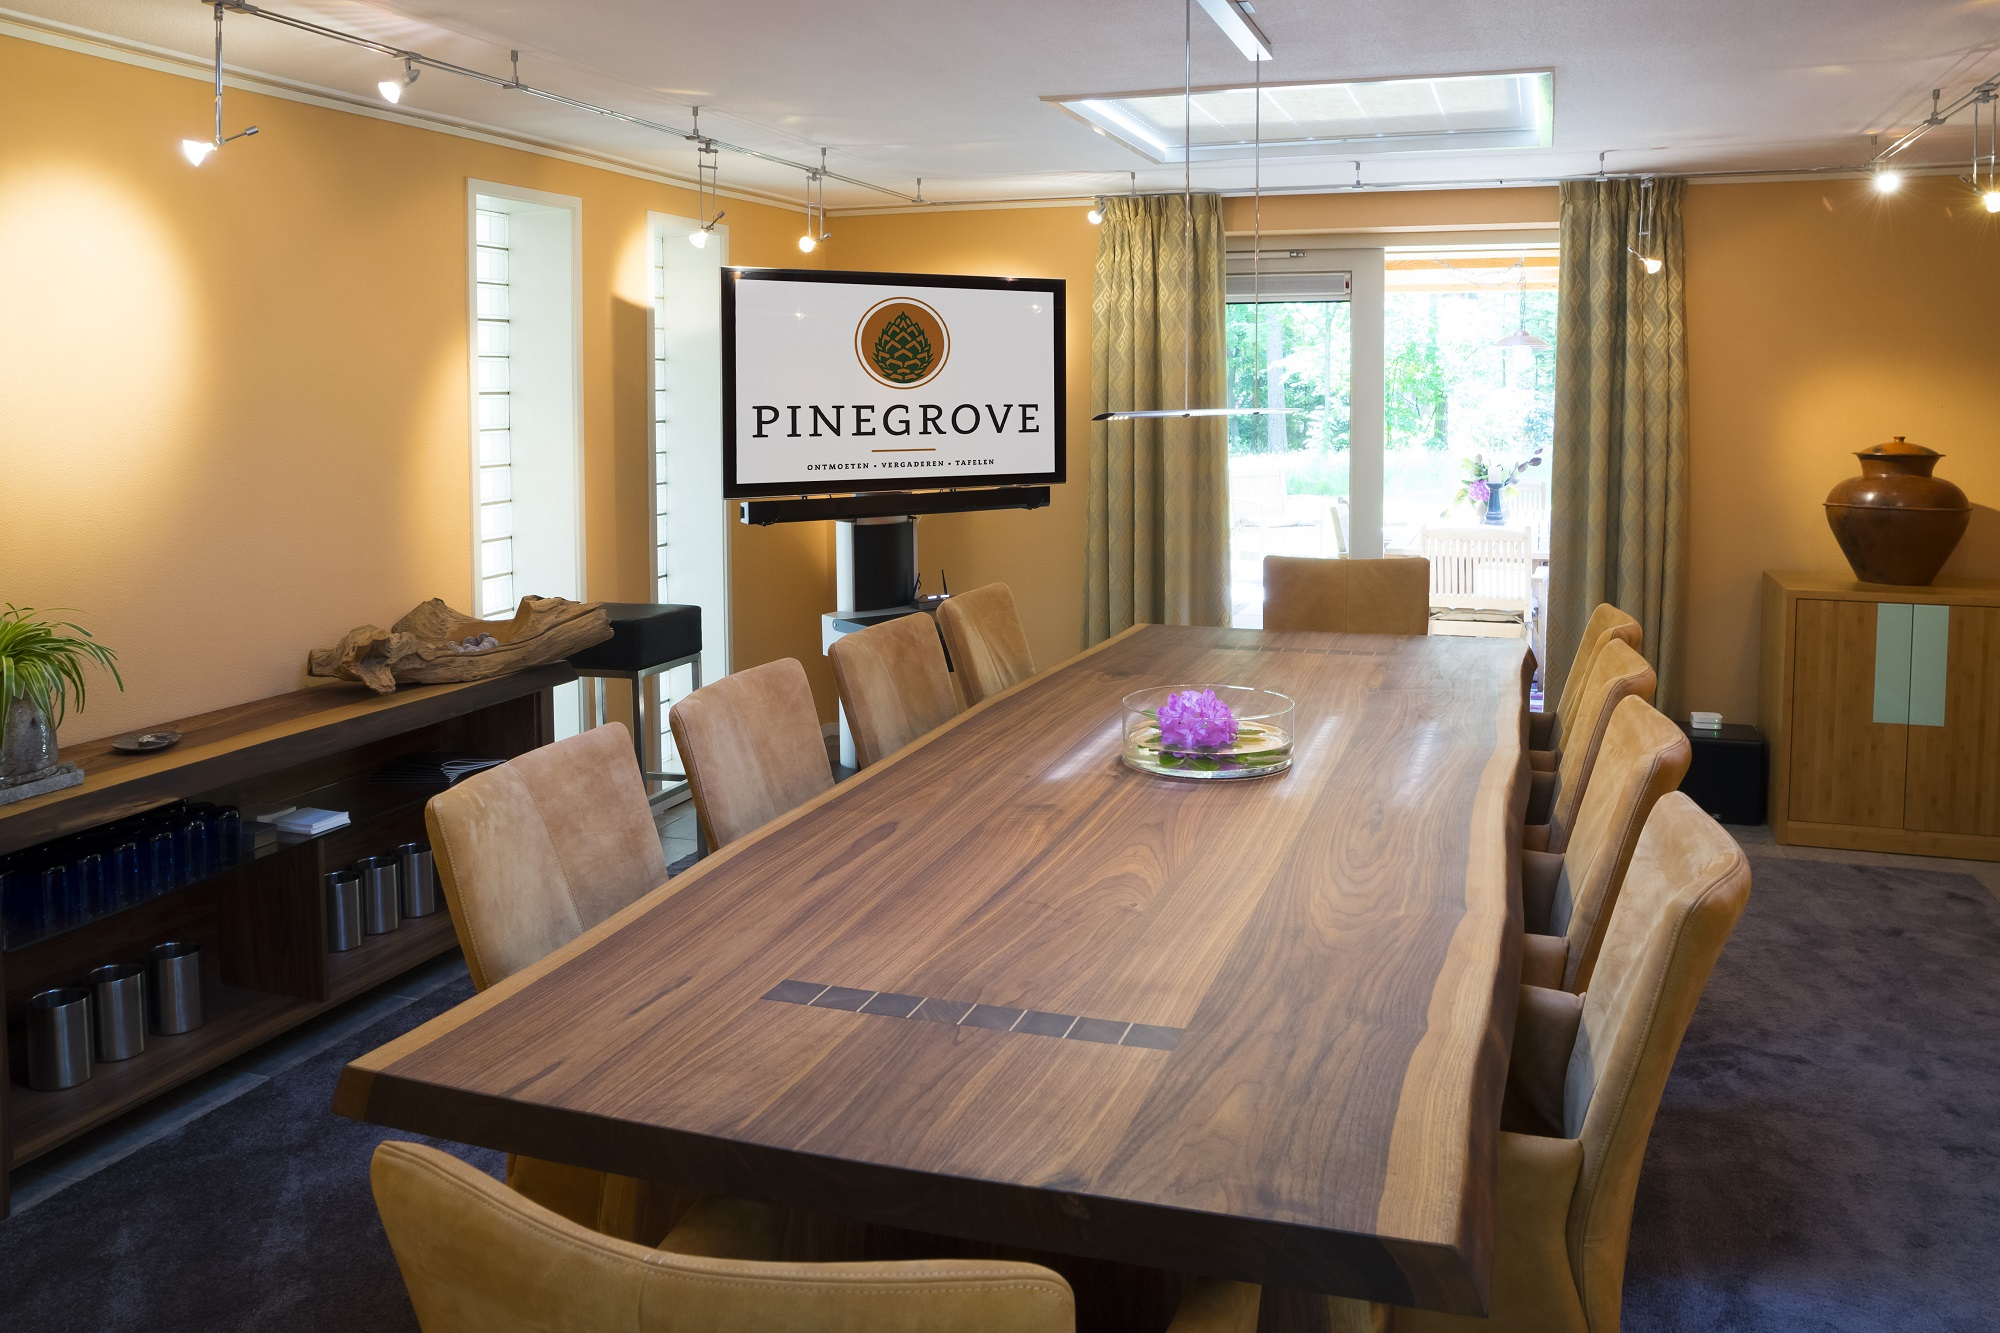 Pinegrove 2